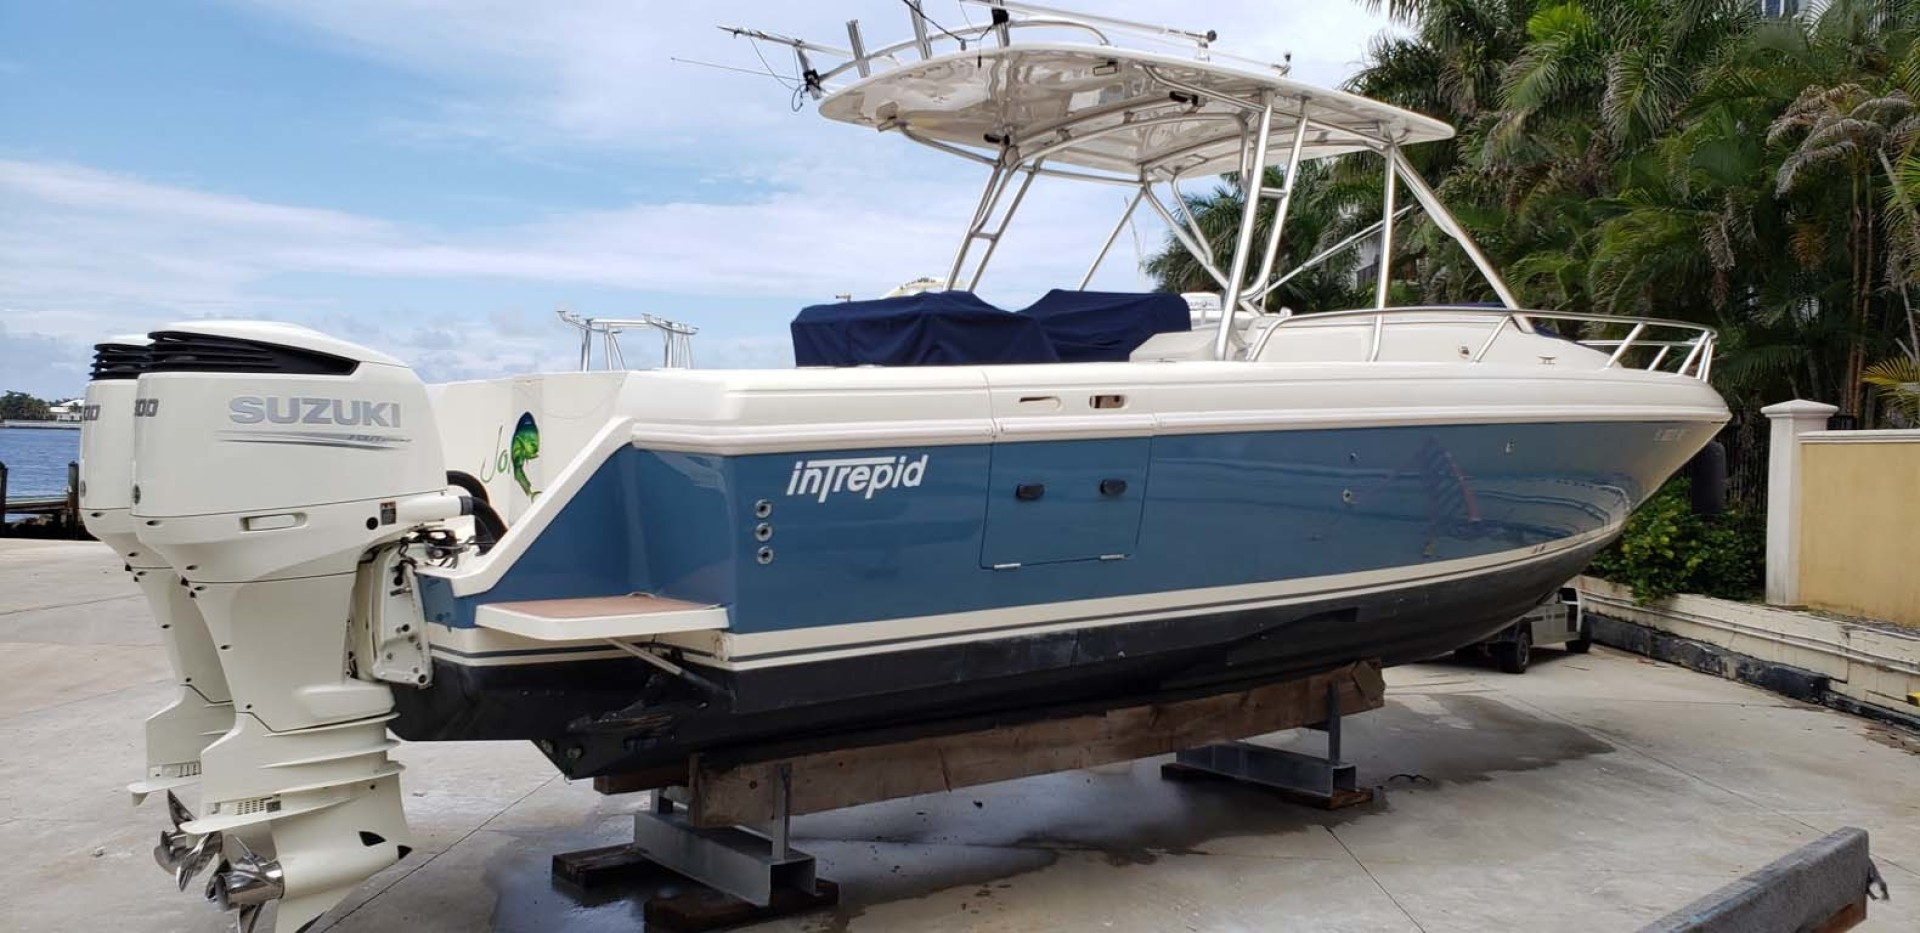 Intrepid-348 Walkaround 2003 -West Palm Beach-Florida-United States-1428811 | Thumbnail